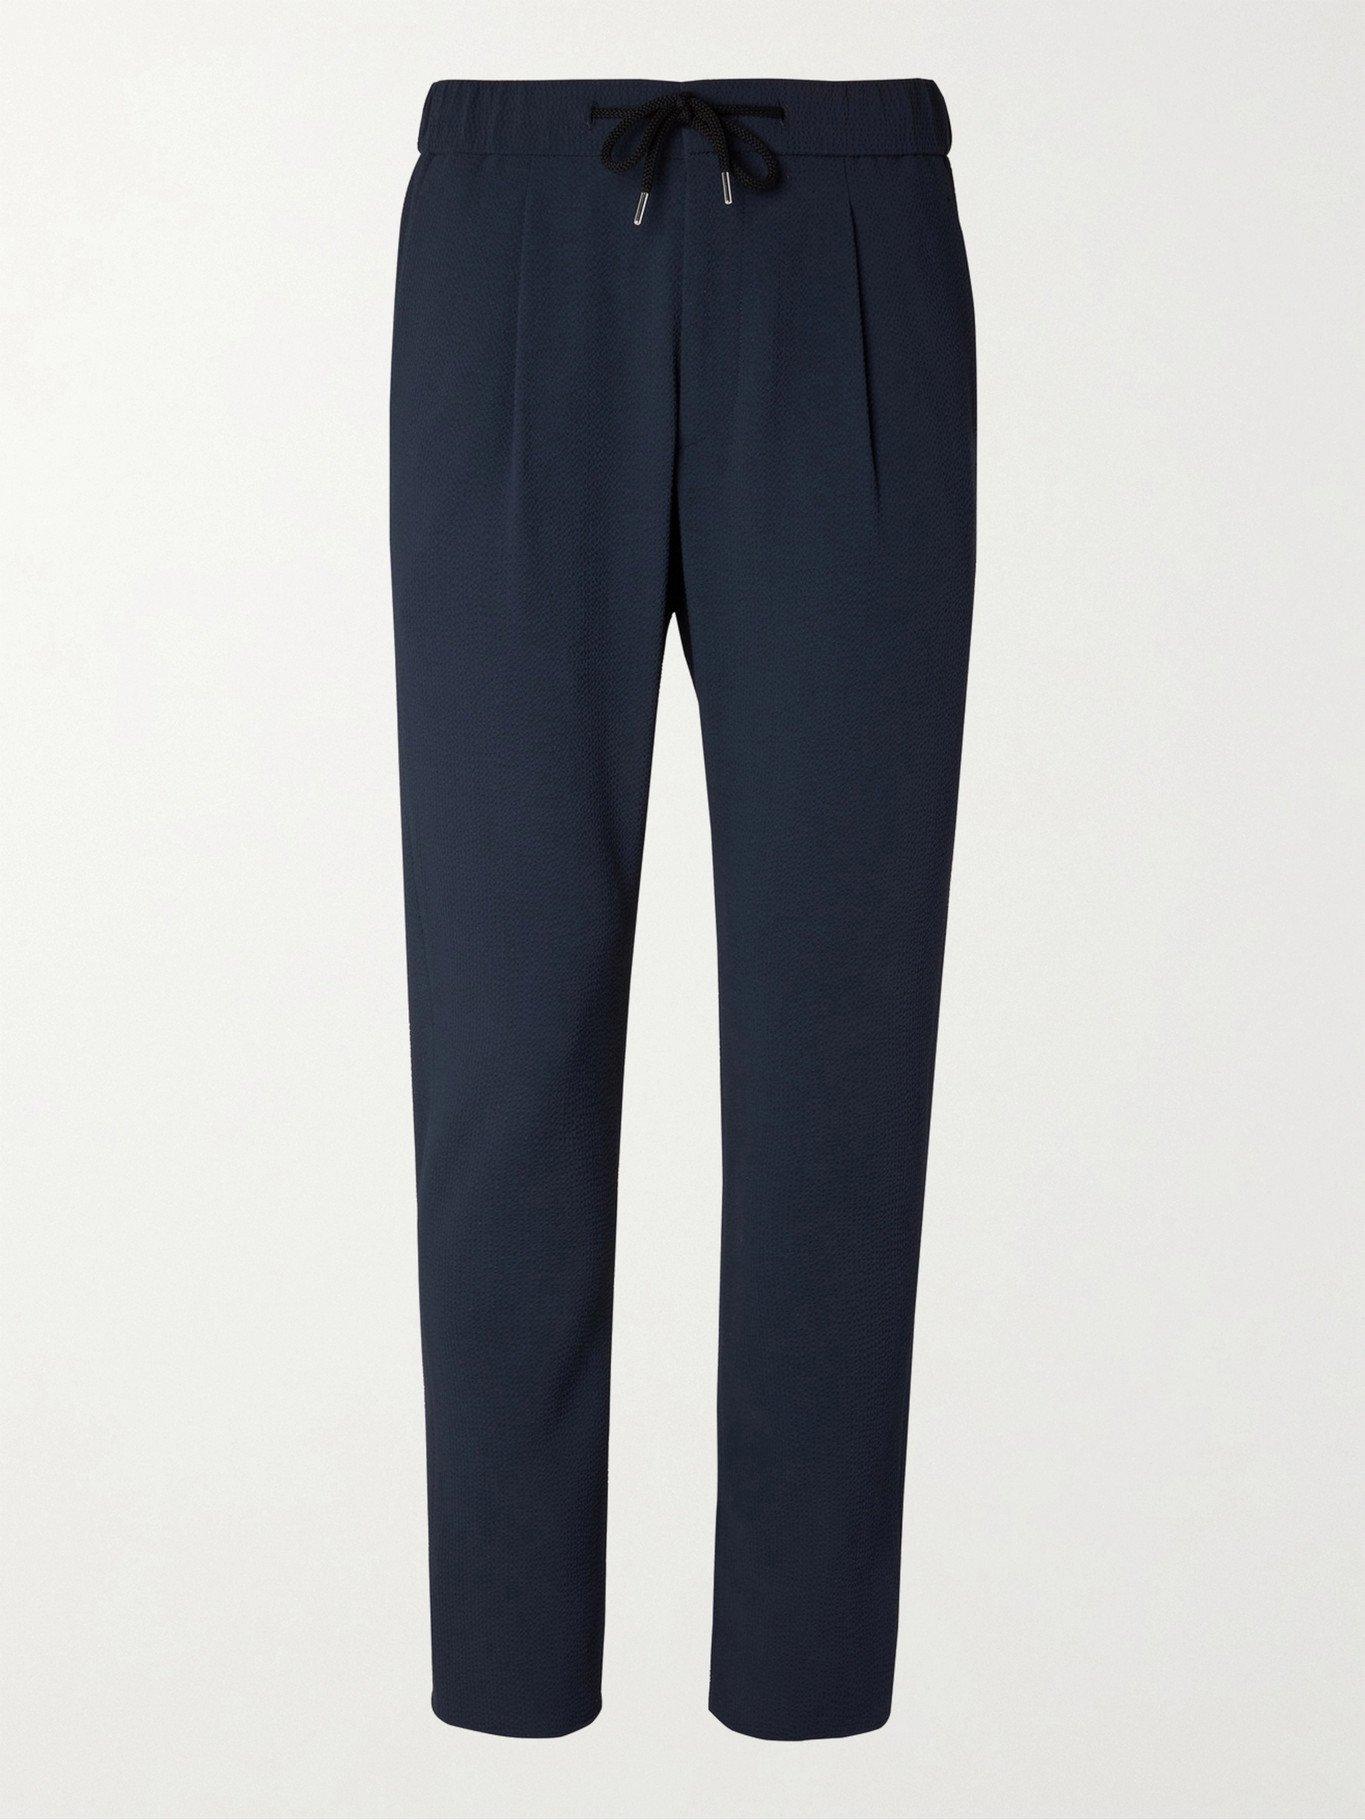 GIORGIO ARMANI - Tapered Stretch-Virgin Wool Seersucker Drawstring Trousers - Blue